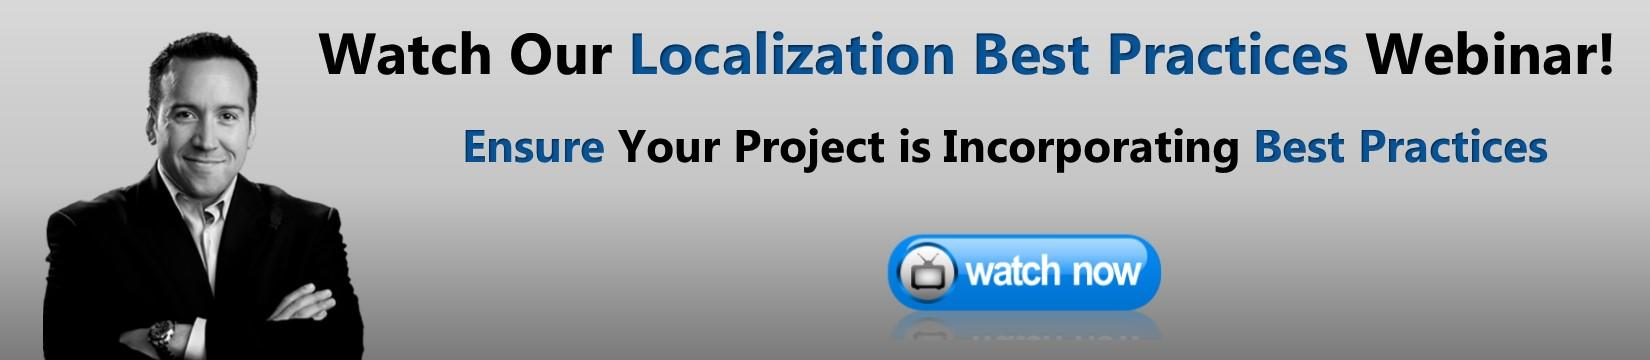 localization best practices webinar